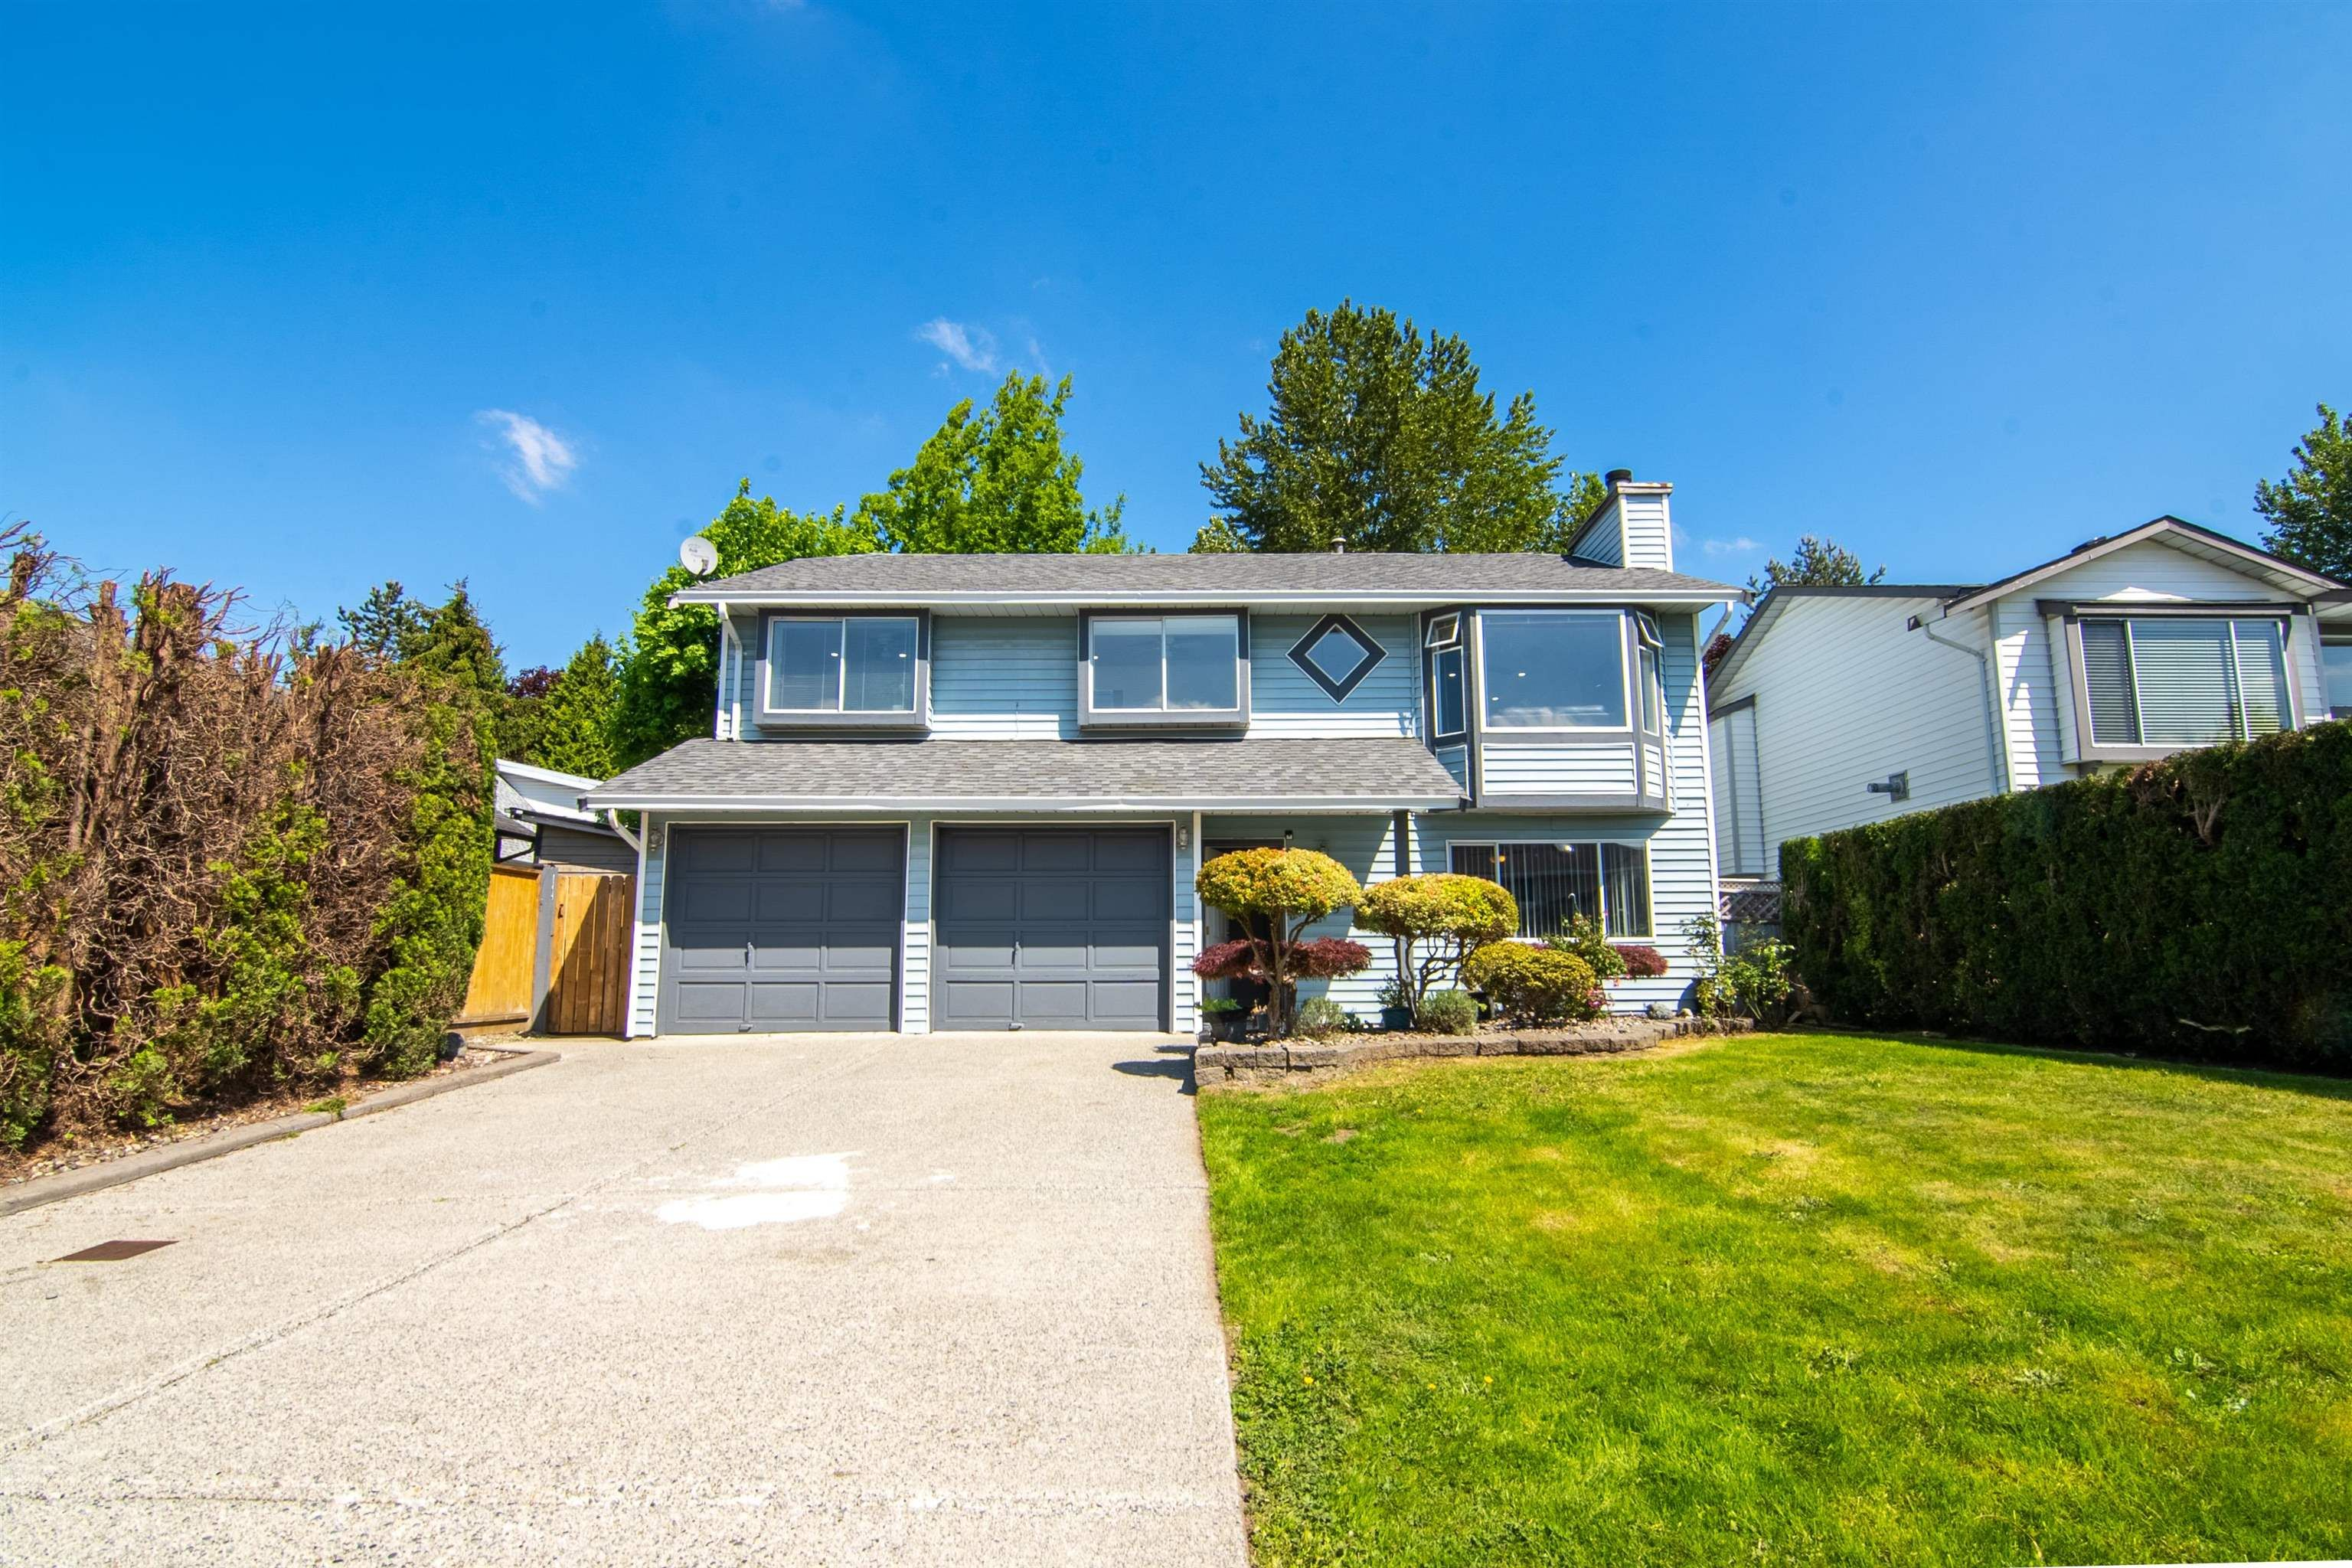 Main Photo: 20085 119A Avenue in Maple Ridge: Southwest Maple Ridge House for sale : MLS®# R2625110